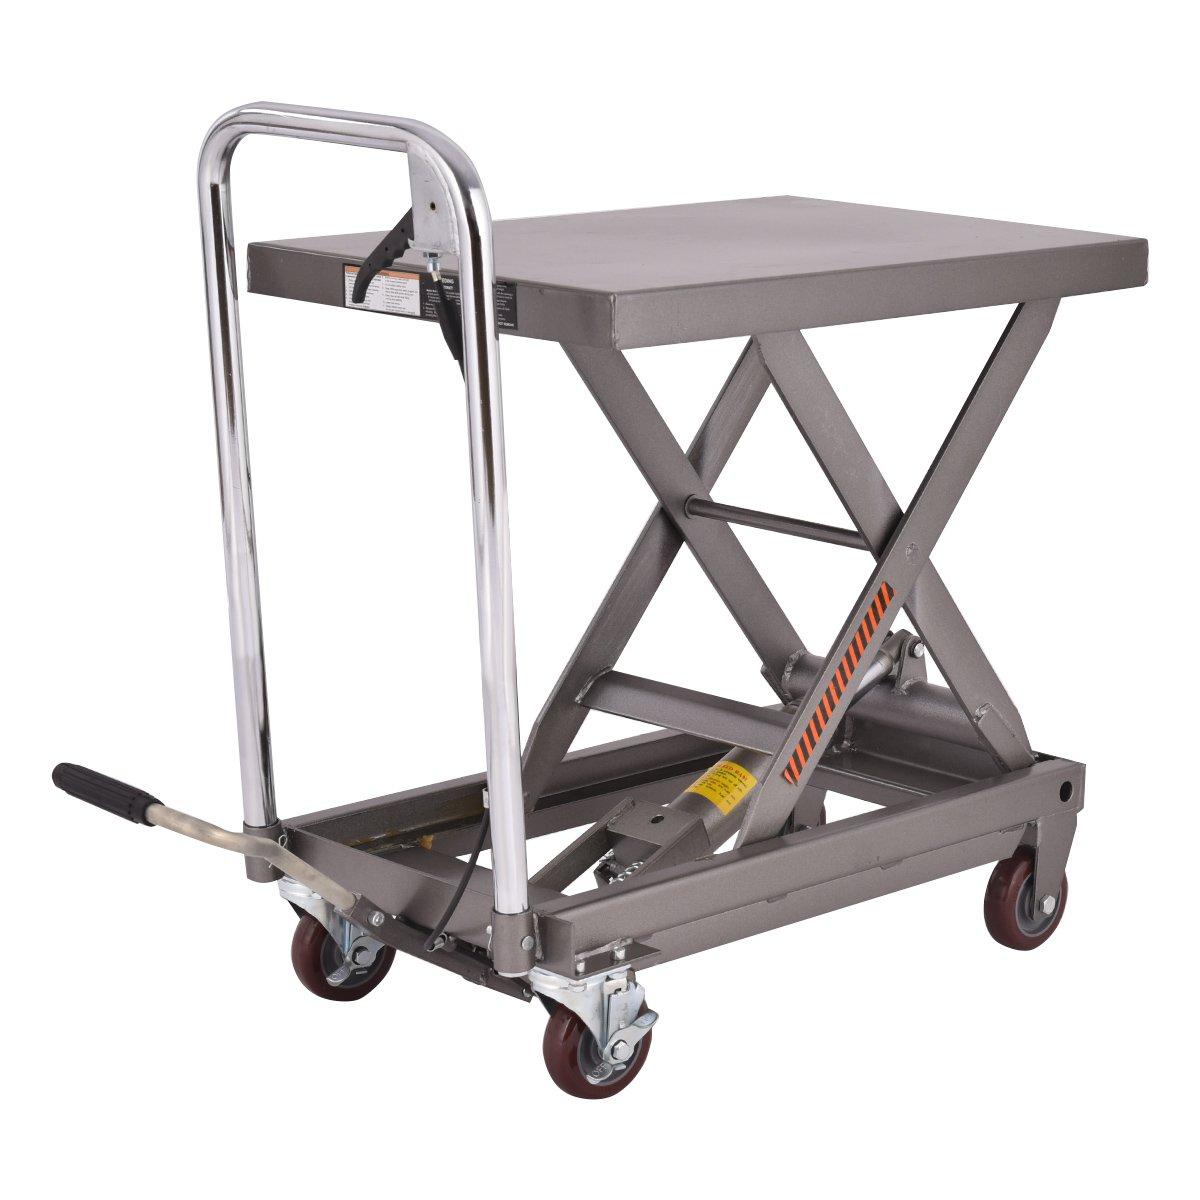 Goplus Hydraulic Scissor Lift Table Cart Dolly Scissor Jack Hoist Stand 500LB Capacity W/Foot Pump